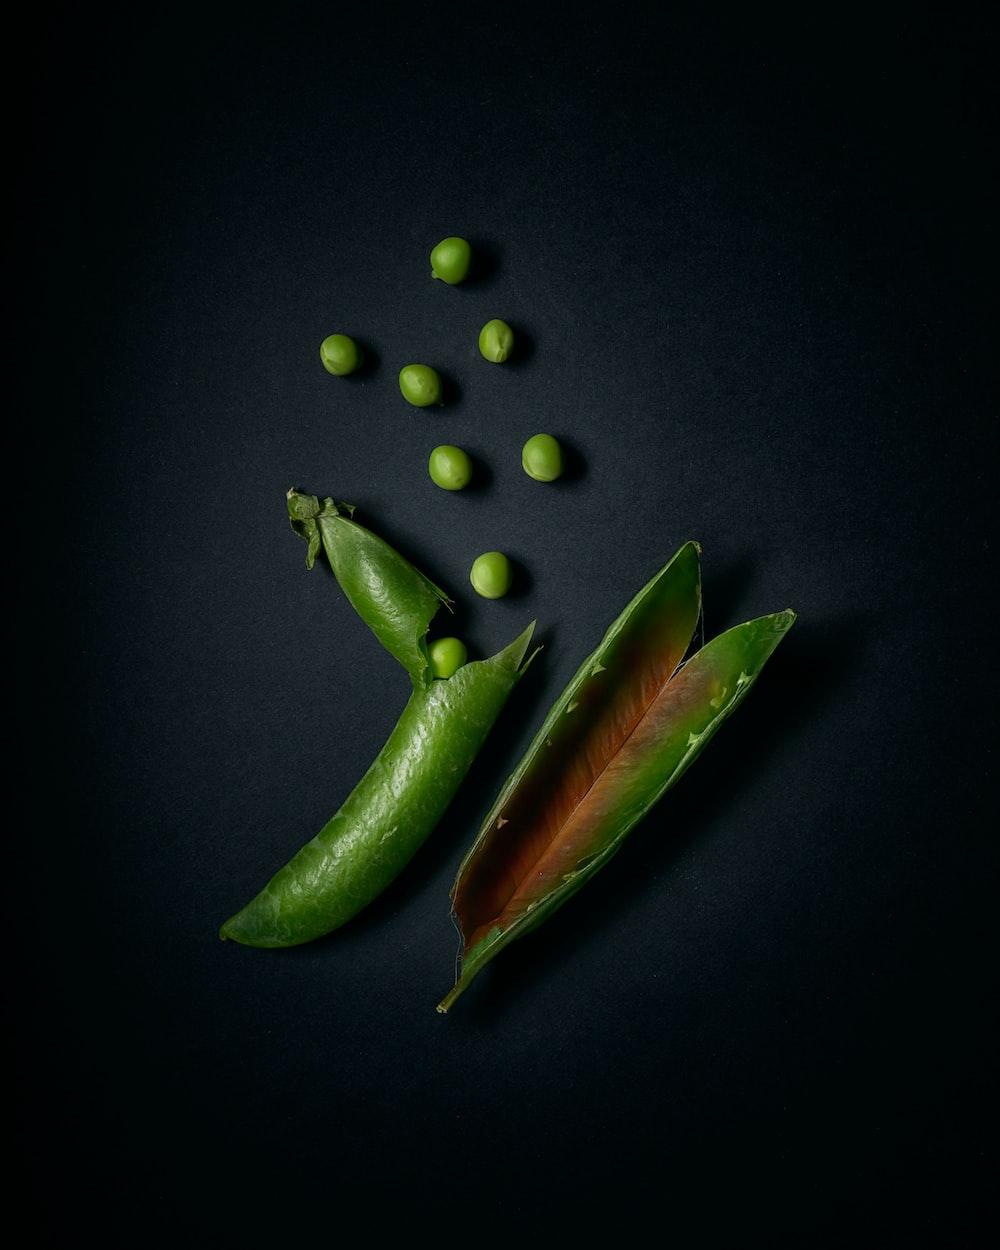 green chili pepper on black background